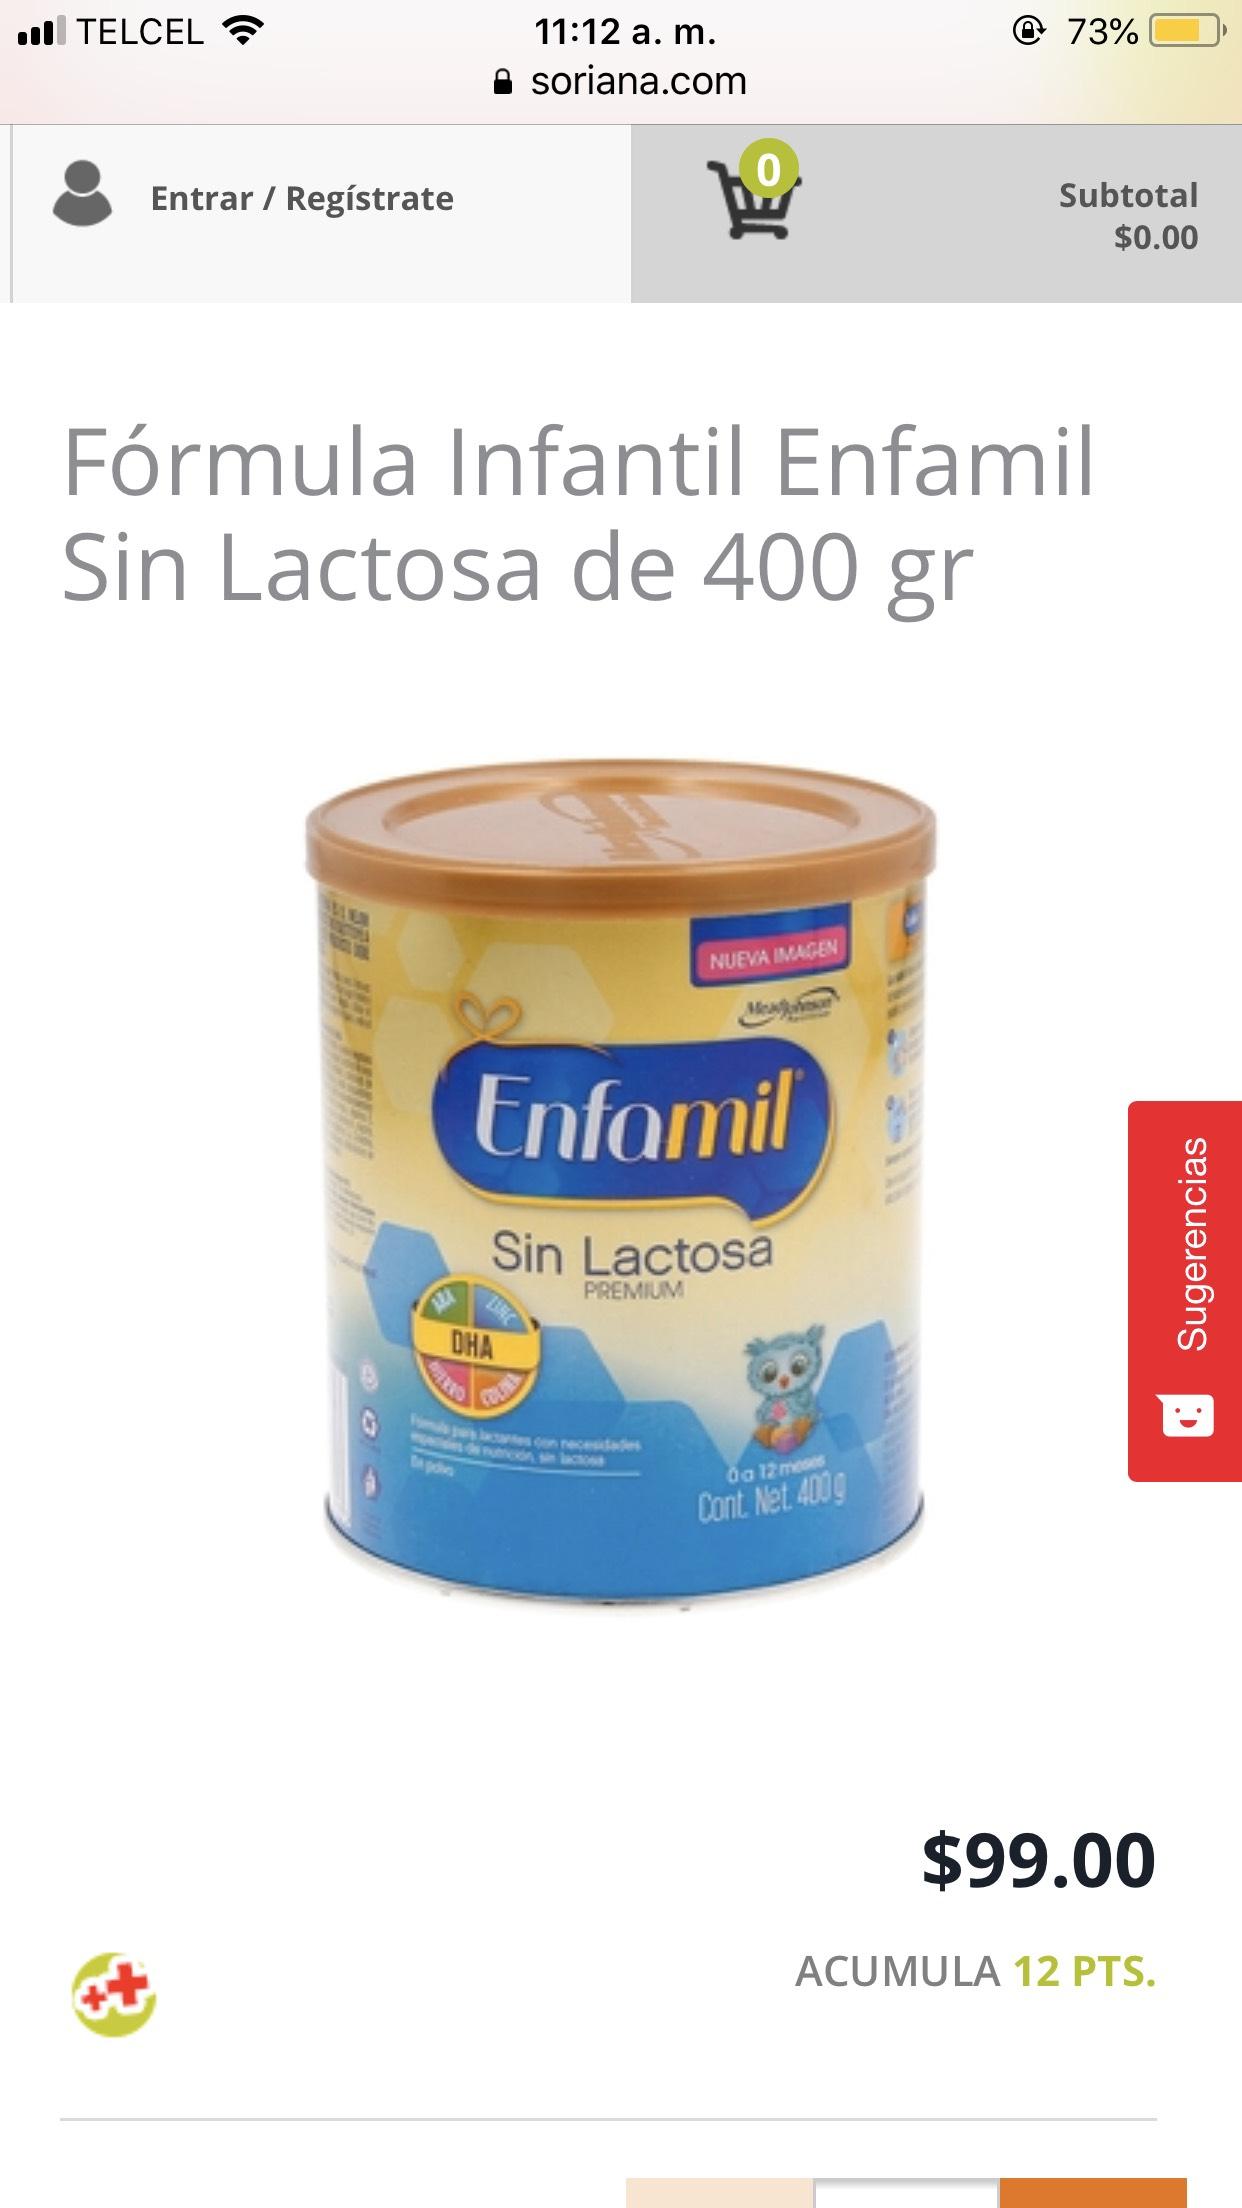 Soriana en linea: leche enfamil sin lactosa 400 grs